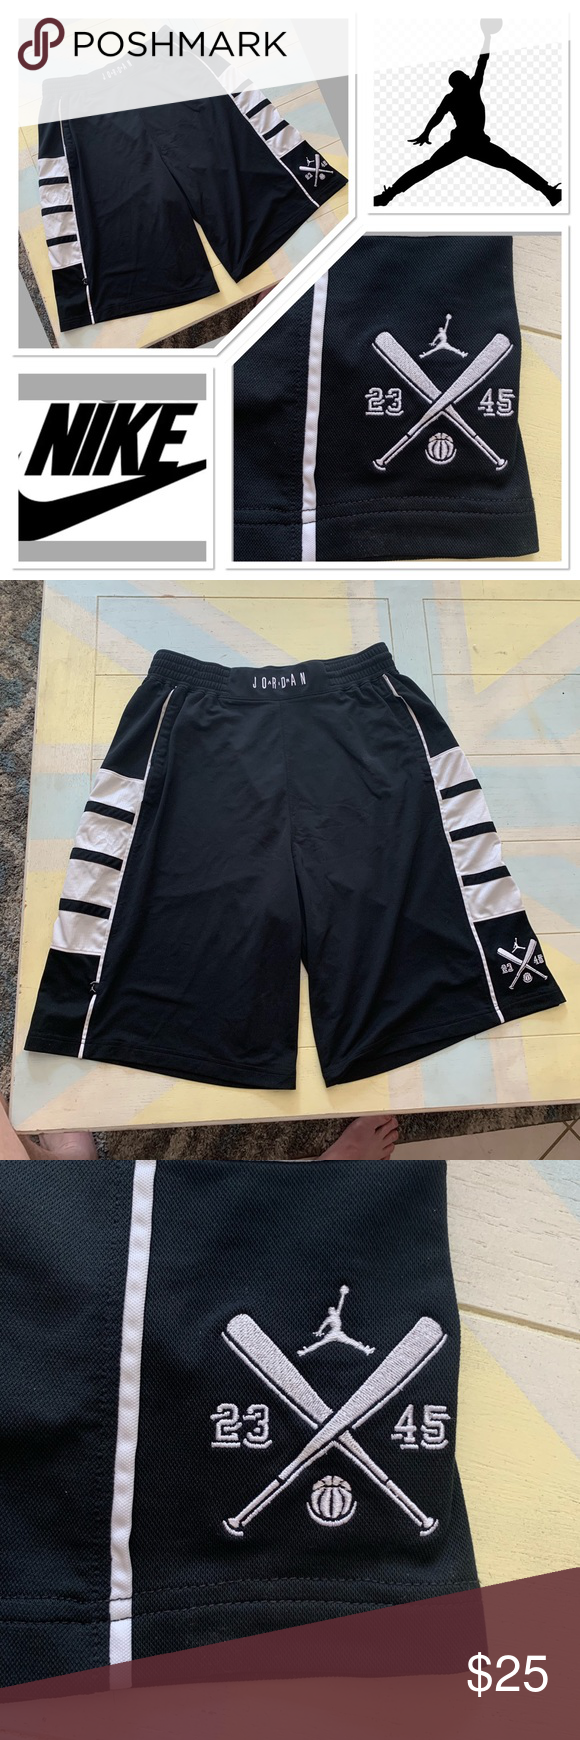 75144766308 Nike Michael Jordan basketball/baseball shorts Vintage Michael Jordan  baseball/basketball crossover shorts.